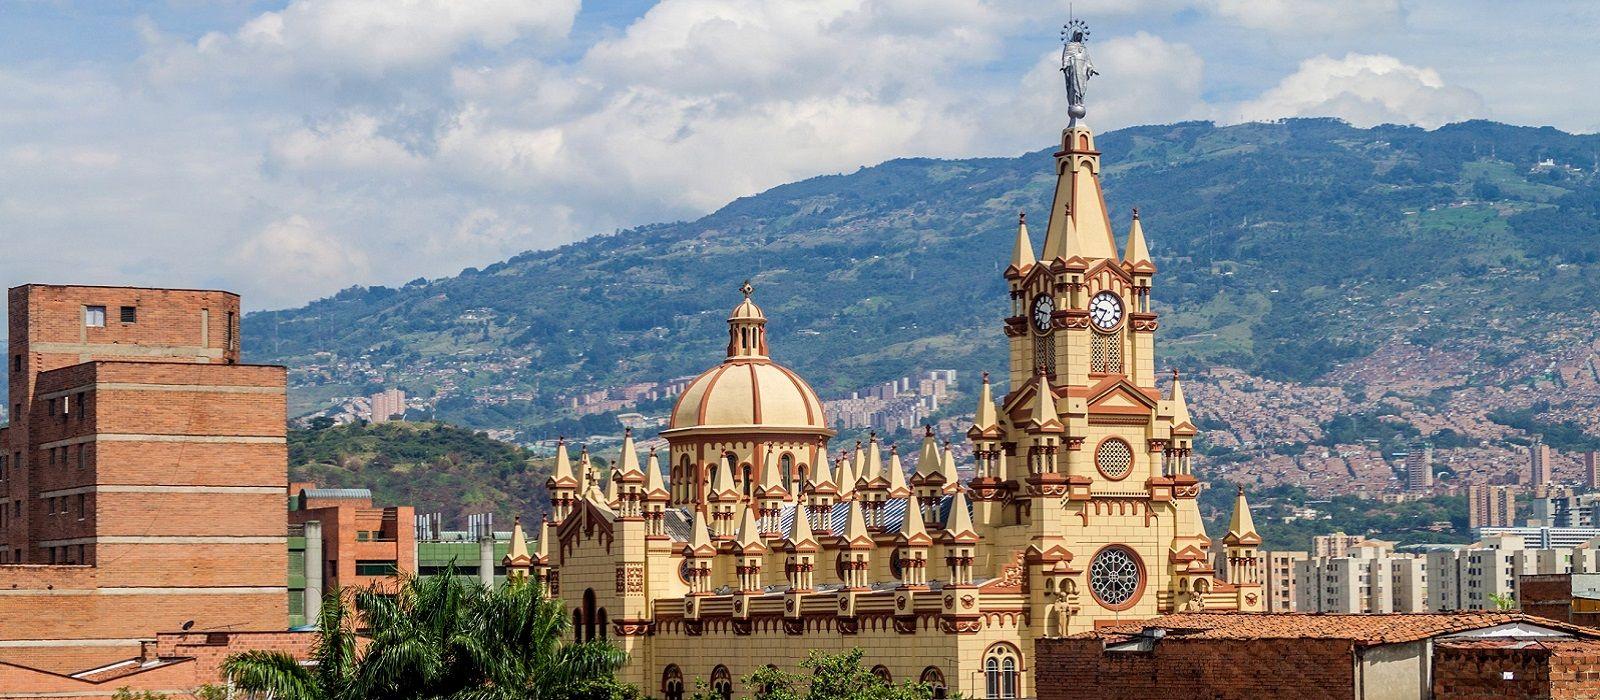 Reiseziel Medellín Kolumbien